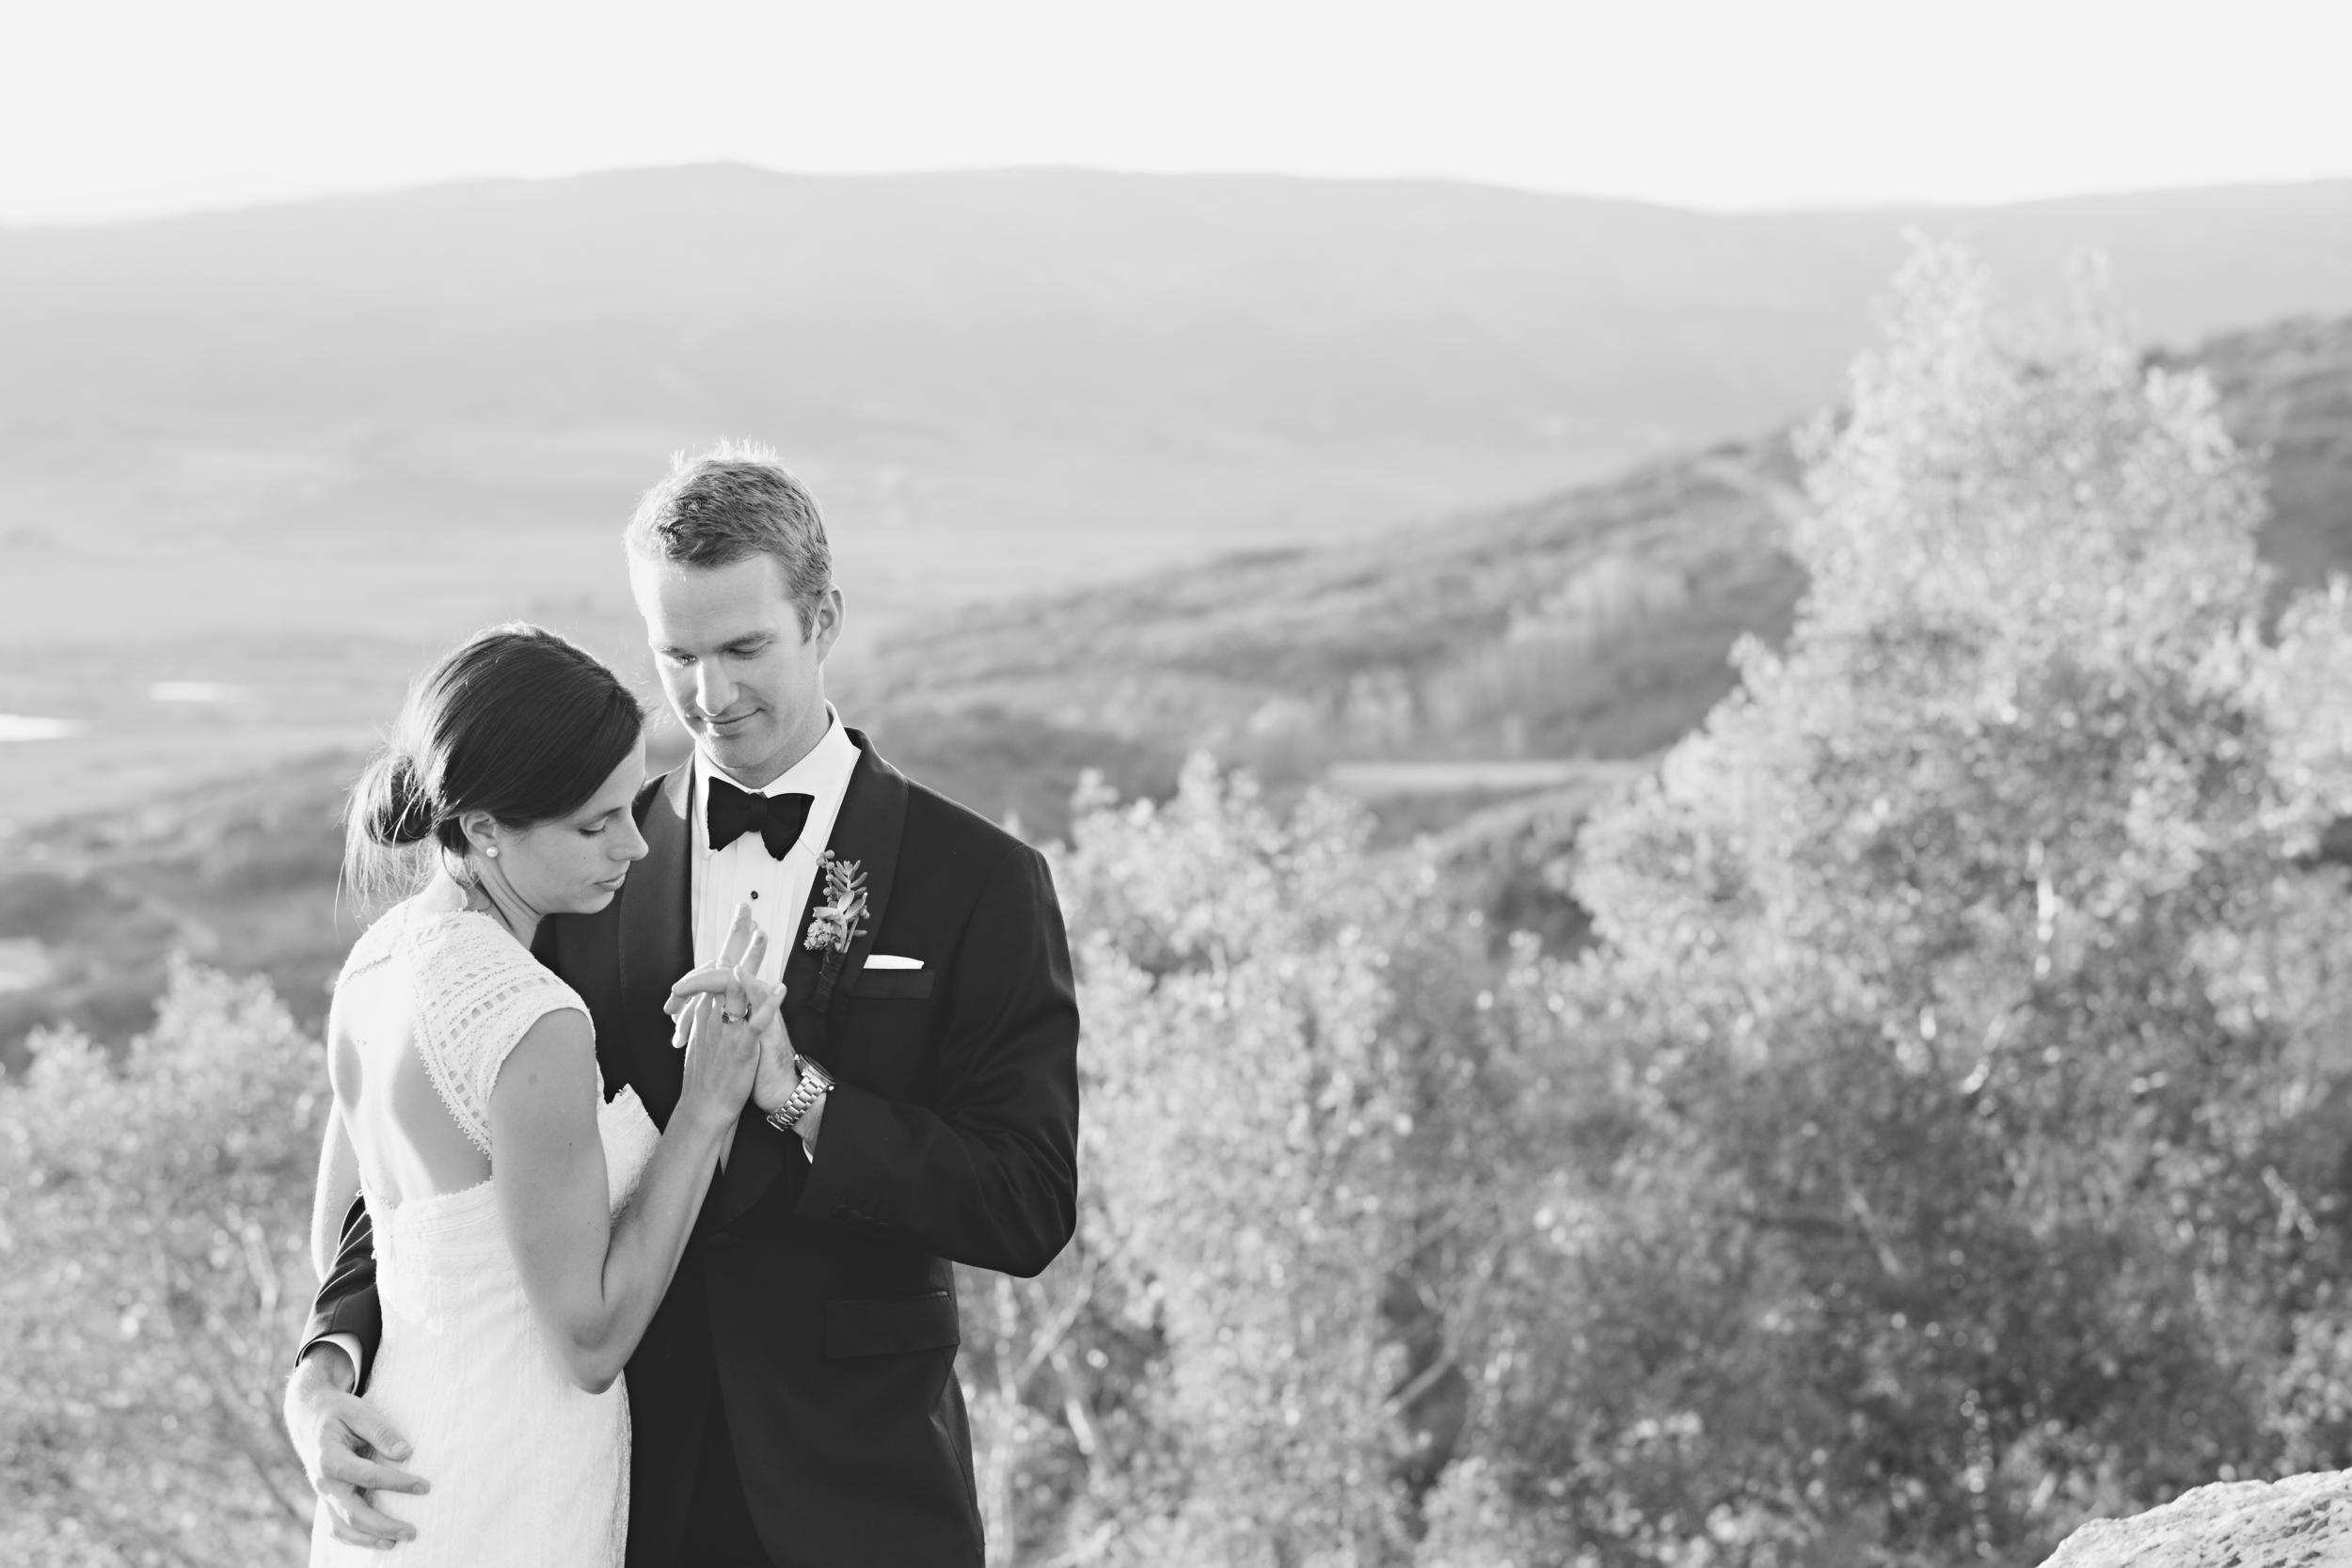 Brad&Libby_Wedding_Photos27137.jpg